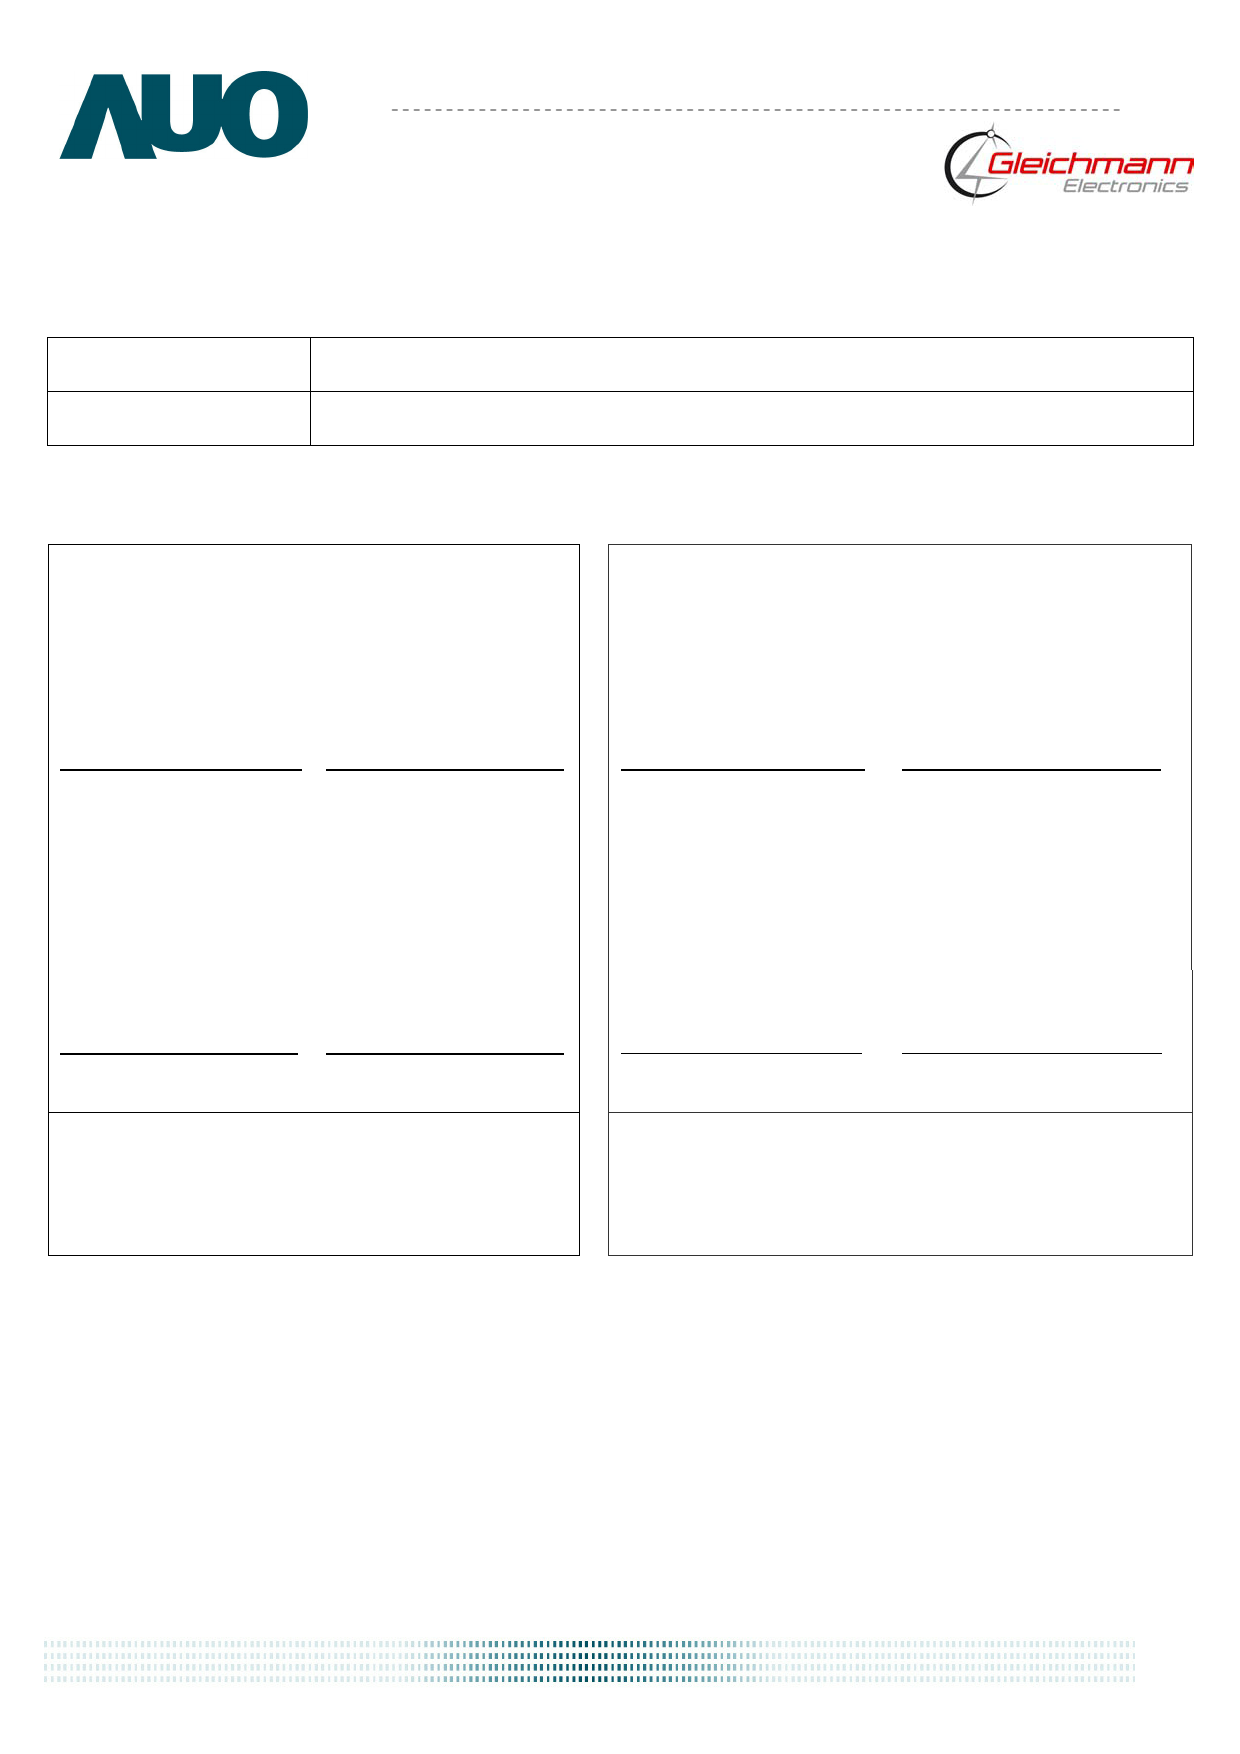 G057QN01-V0 datasheet